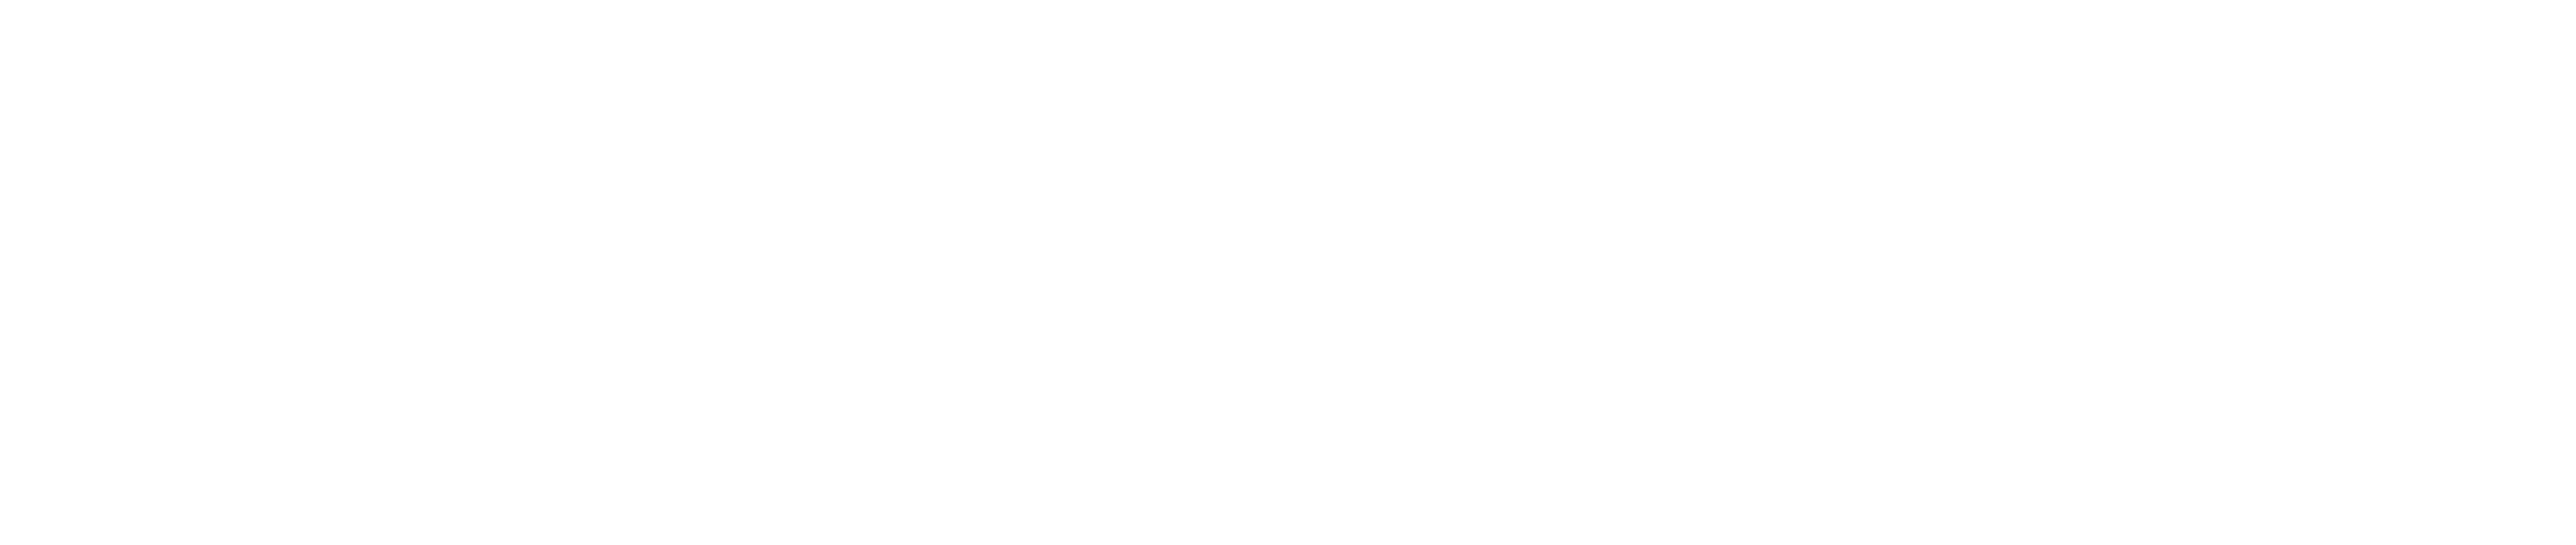 Everytable Logo